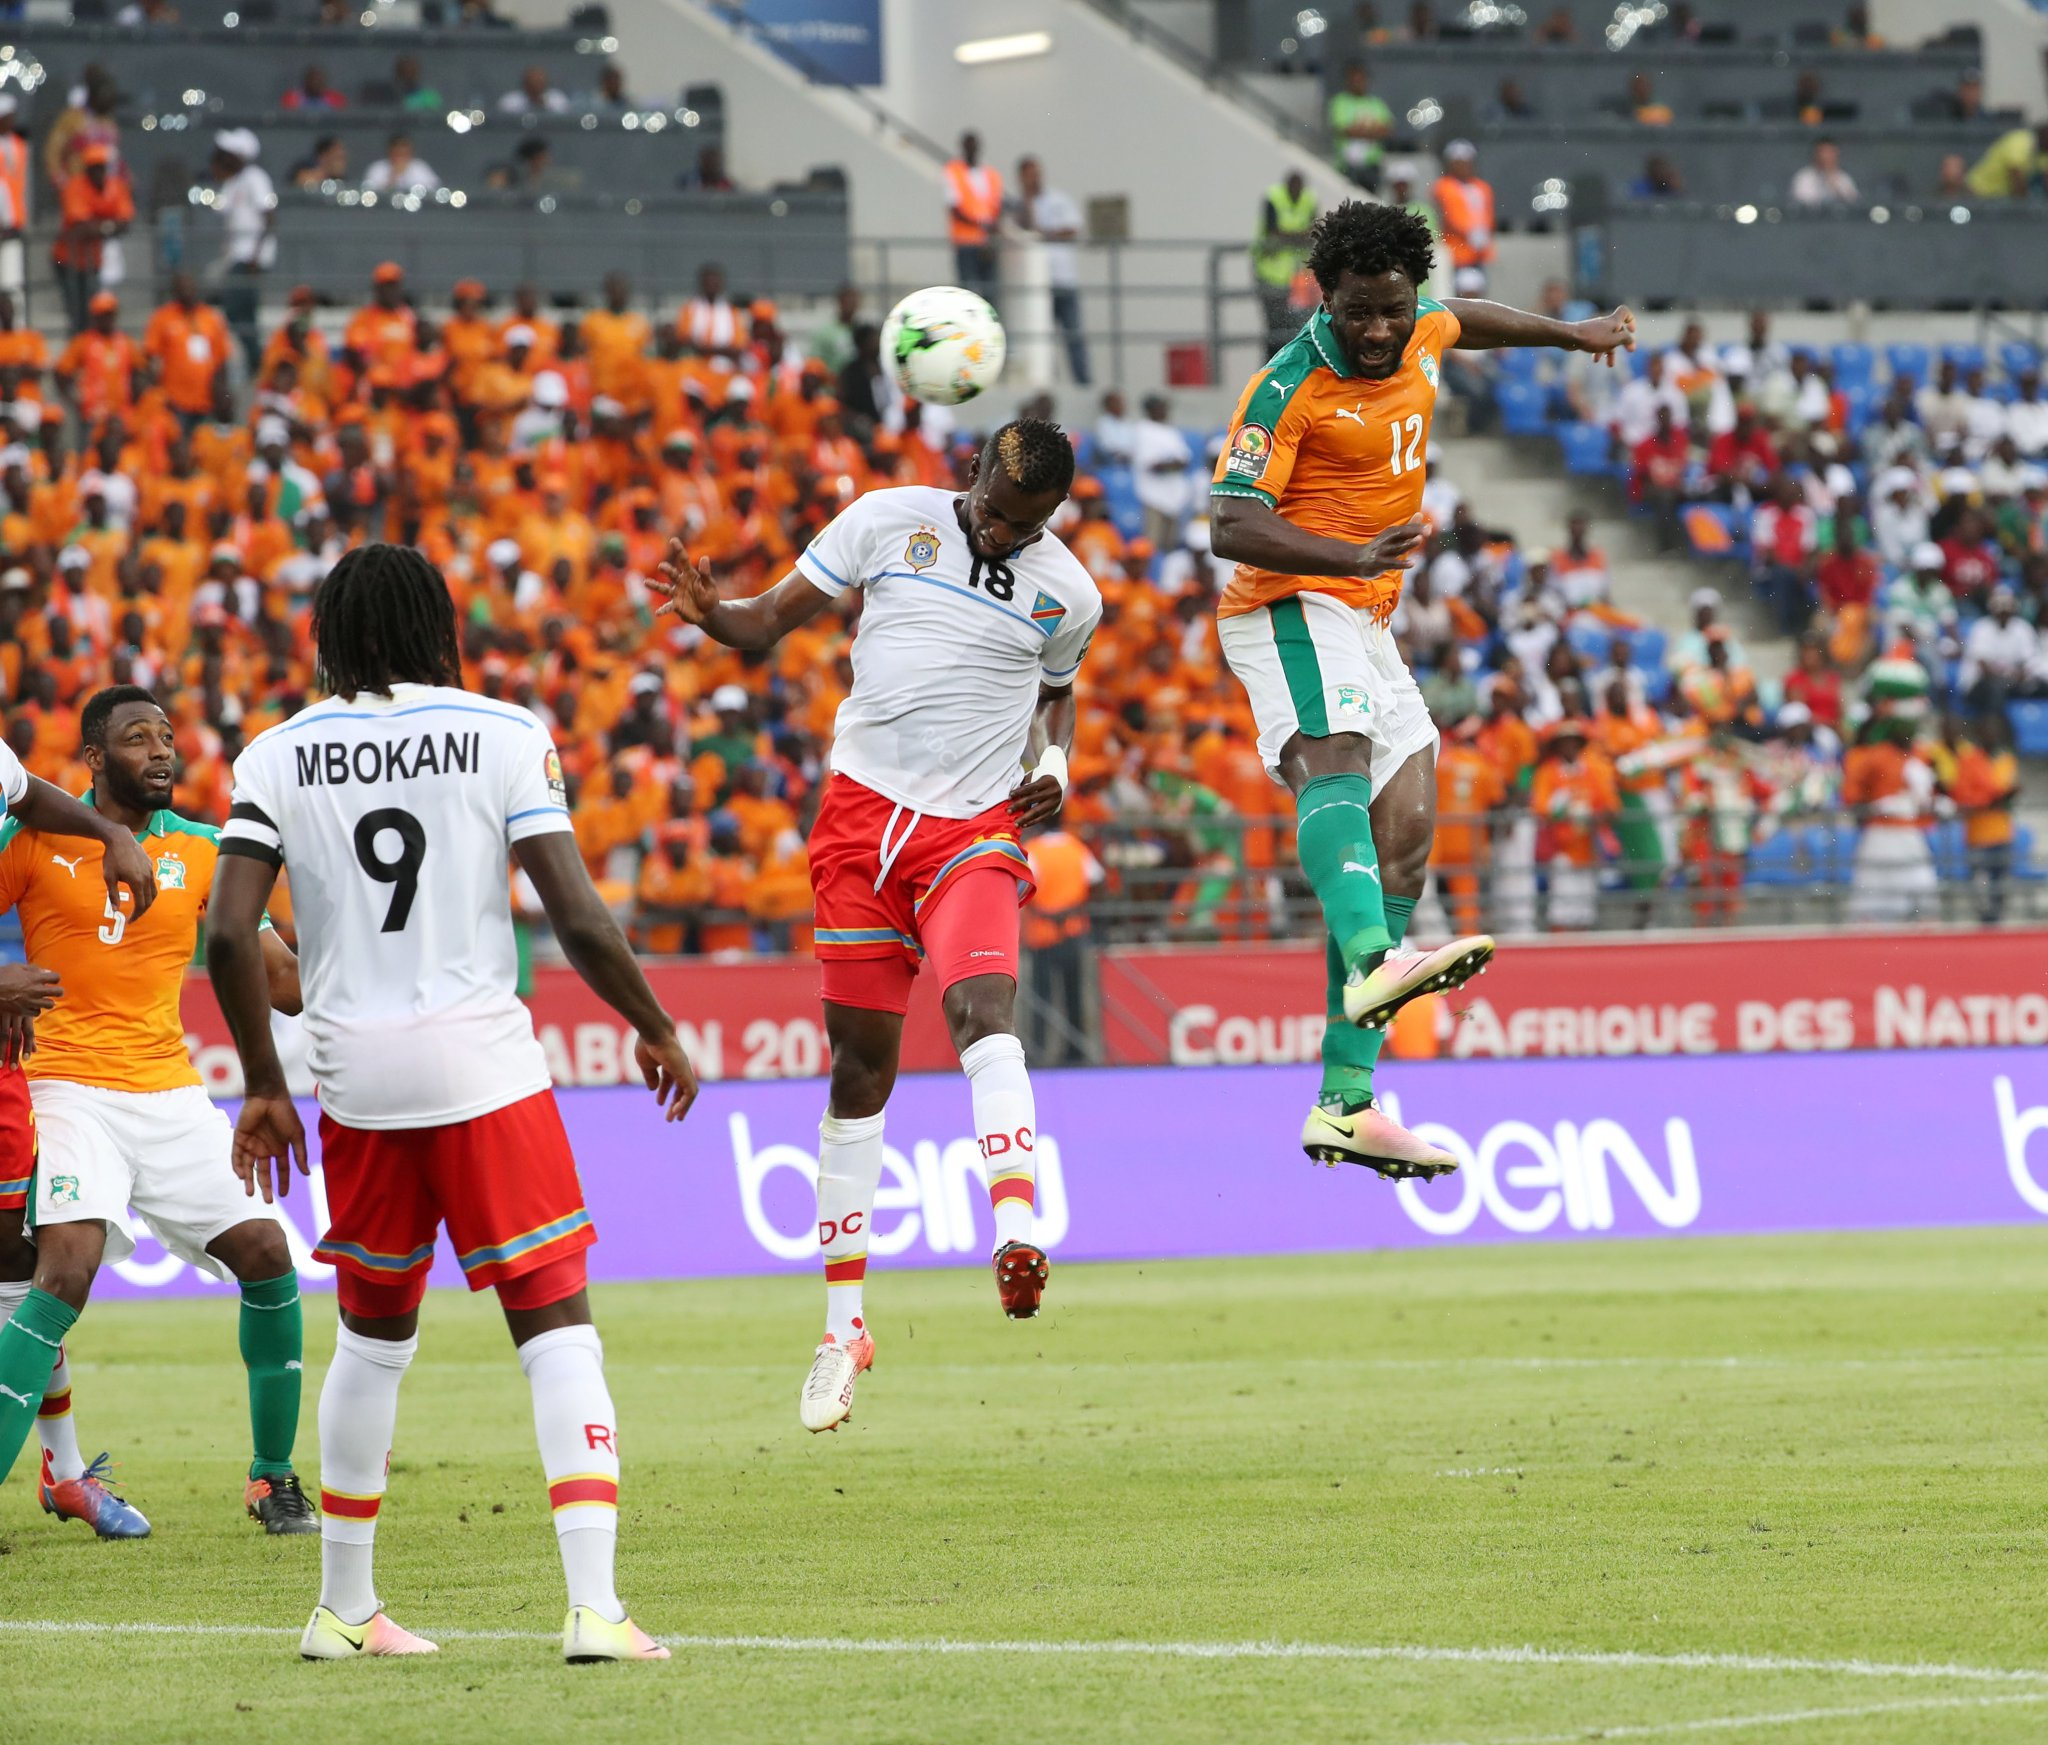 AFCON 2017: DR Congo Hold ReigningChampions CIV